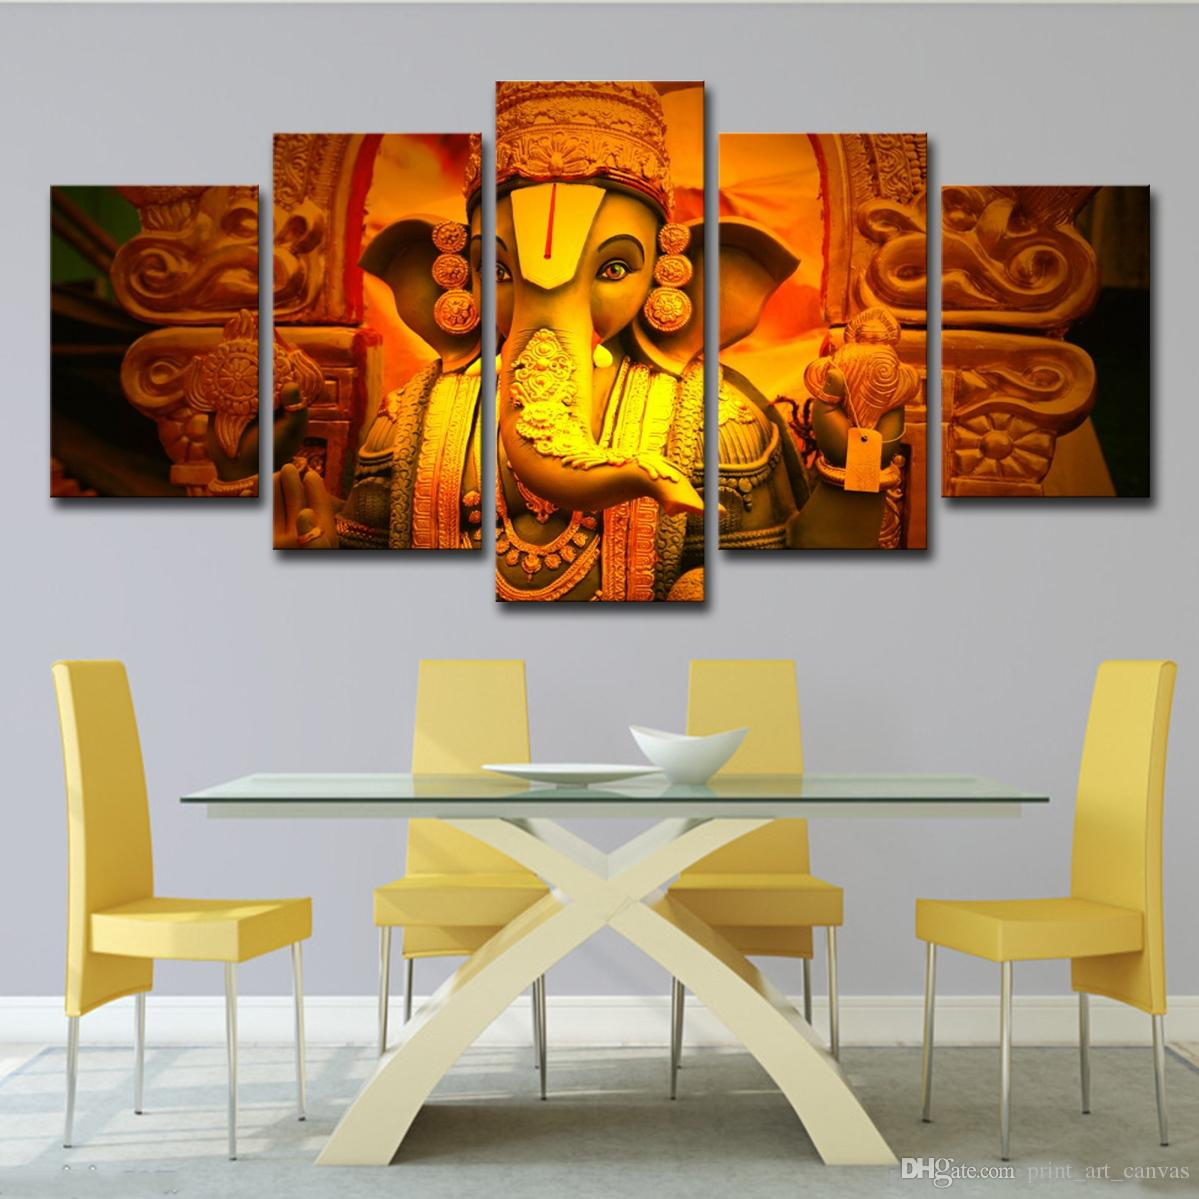 2019 Canvas Painting Wall Art Modern Hd Printed Elephant Head God